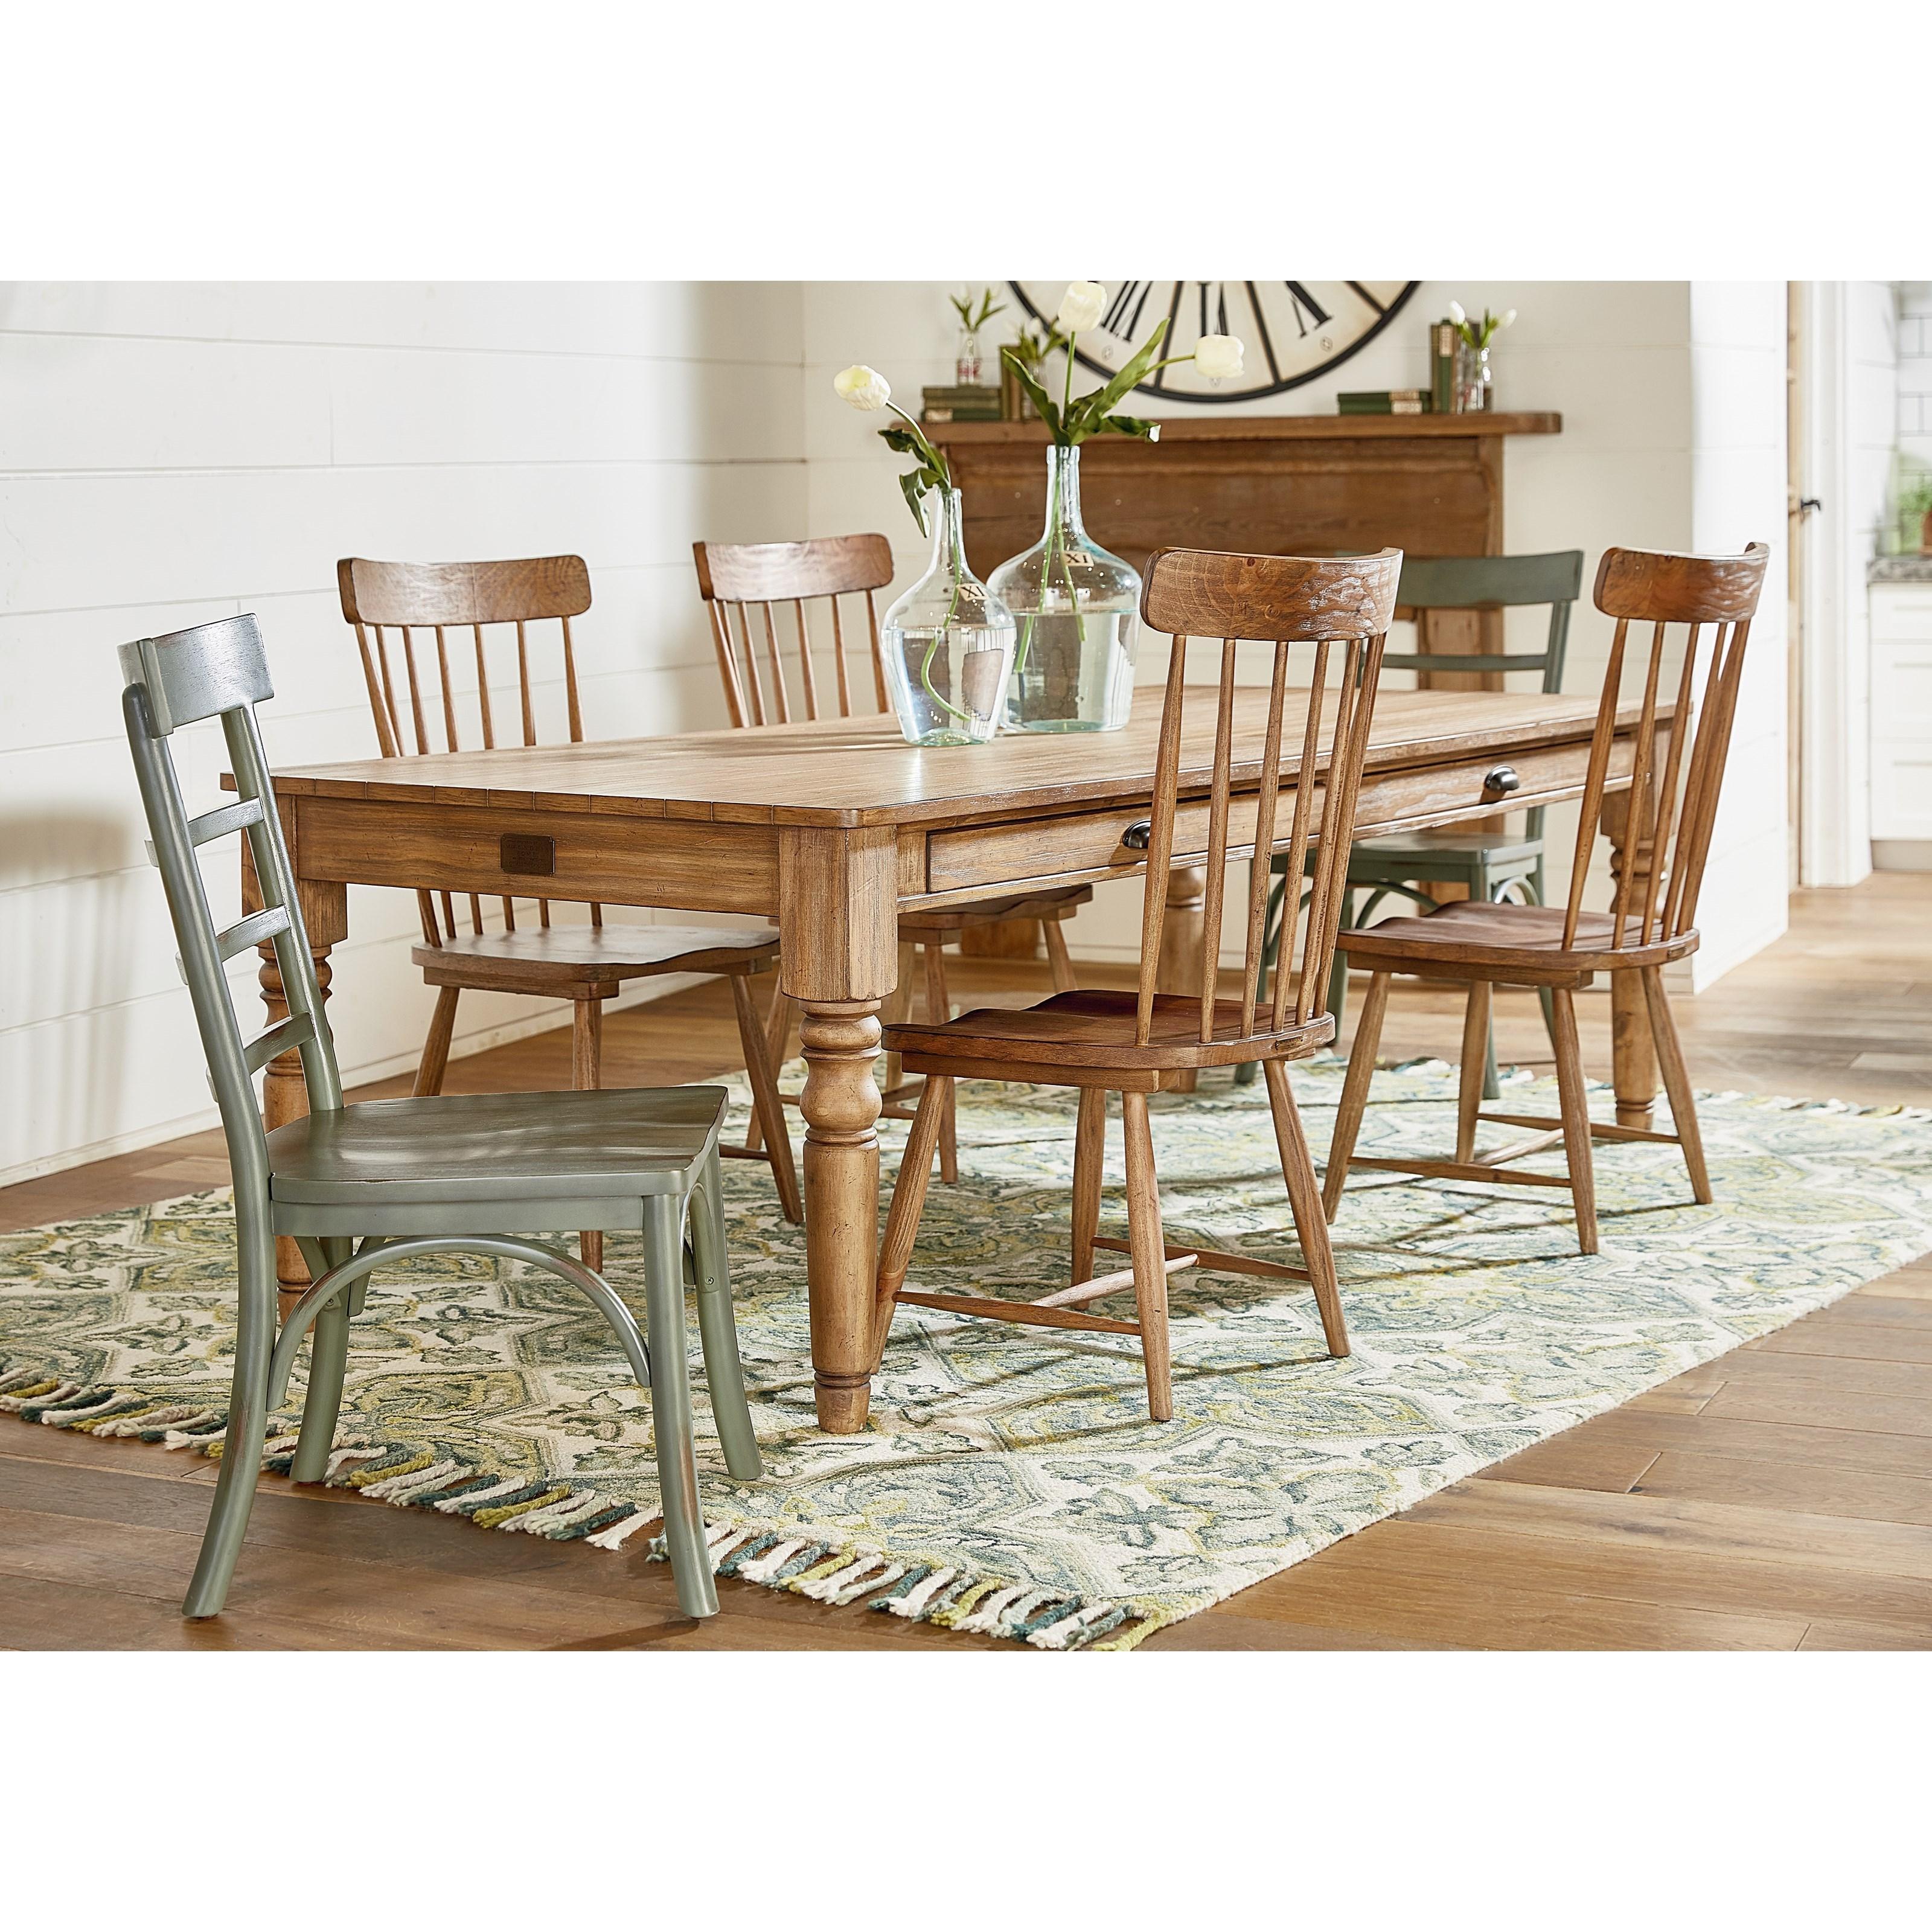 Primitive Dining Room Furniture: Magnolia Home By Joanna Gaines Primitive Slat Back Kempton